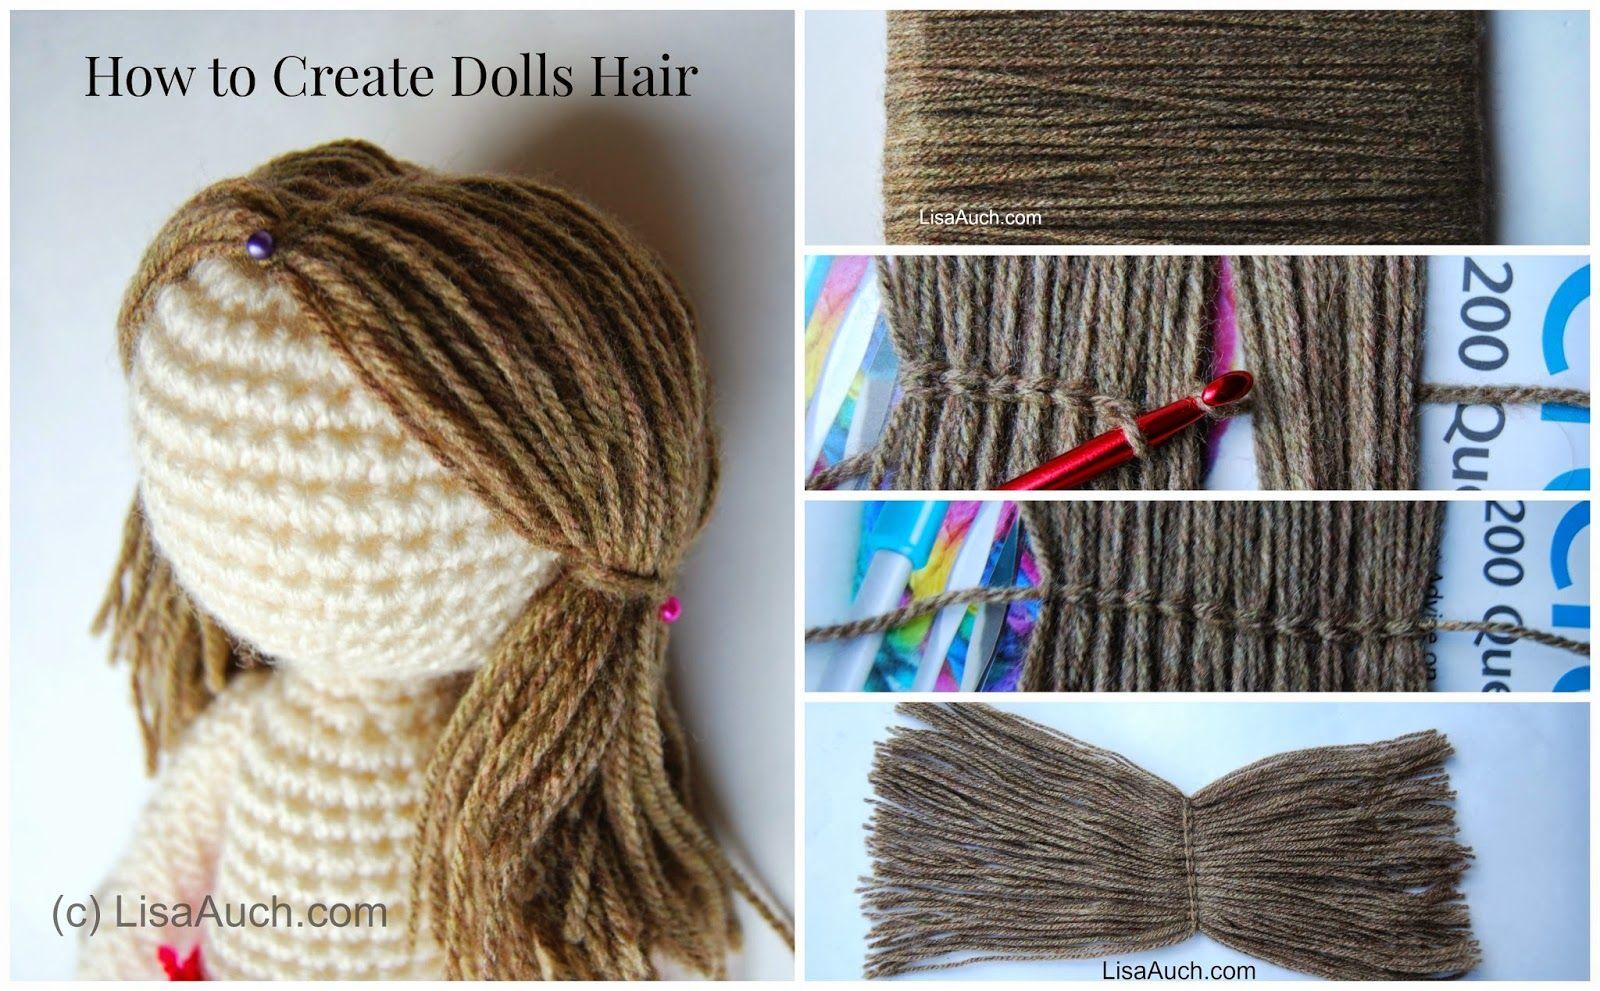 Amigurumi Dolls Free Patterns : Little nurse amigurumi doll with crochet pattern craftstylish